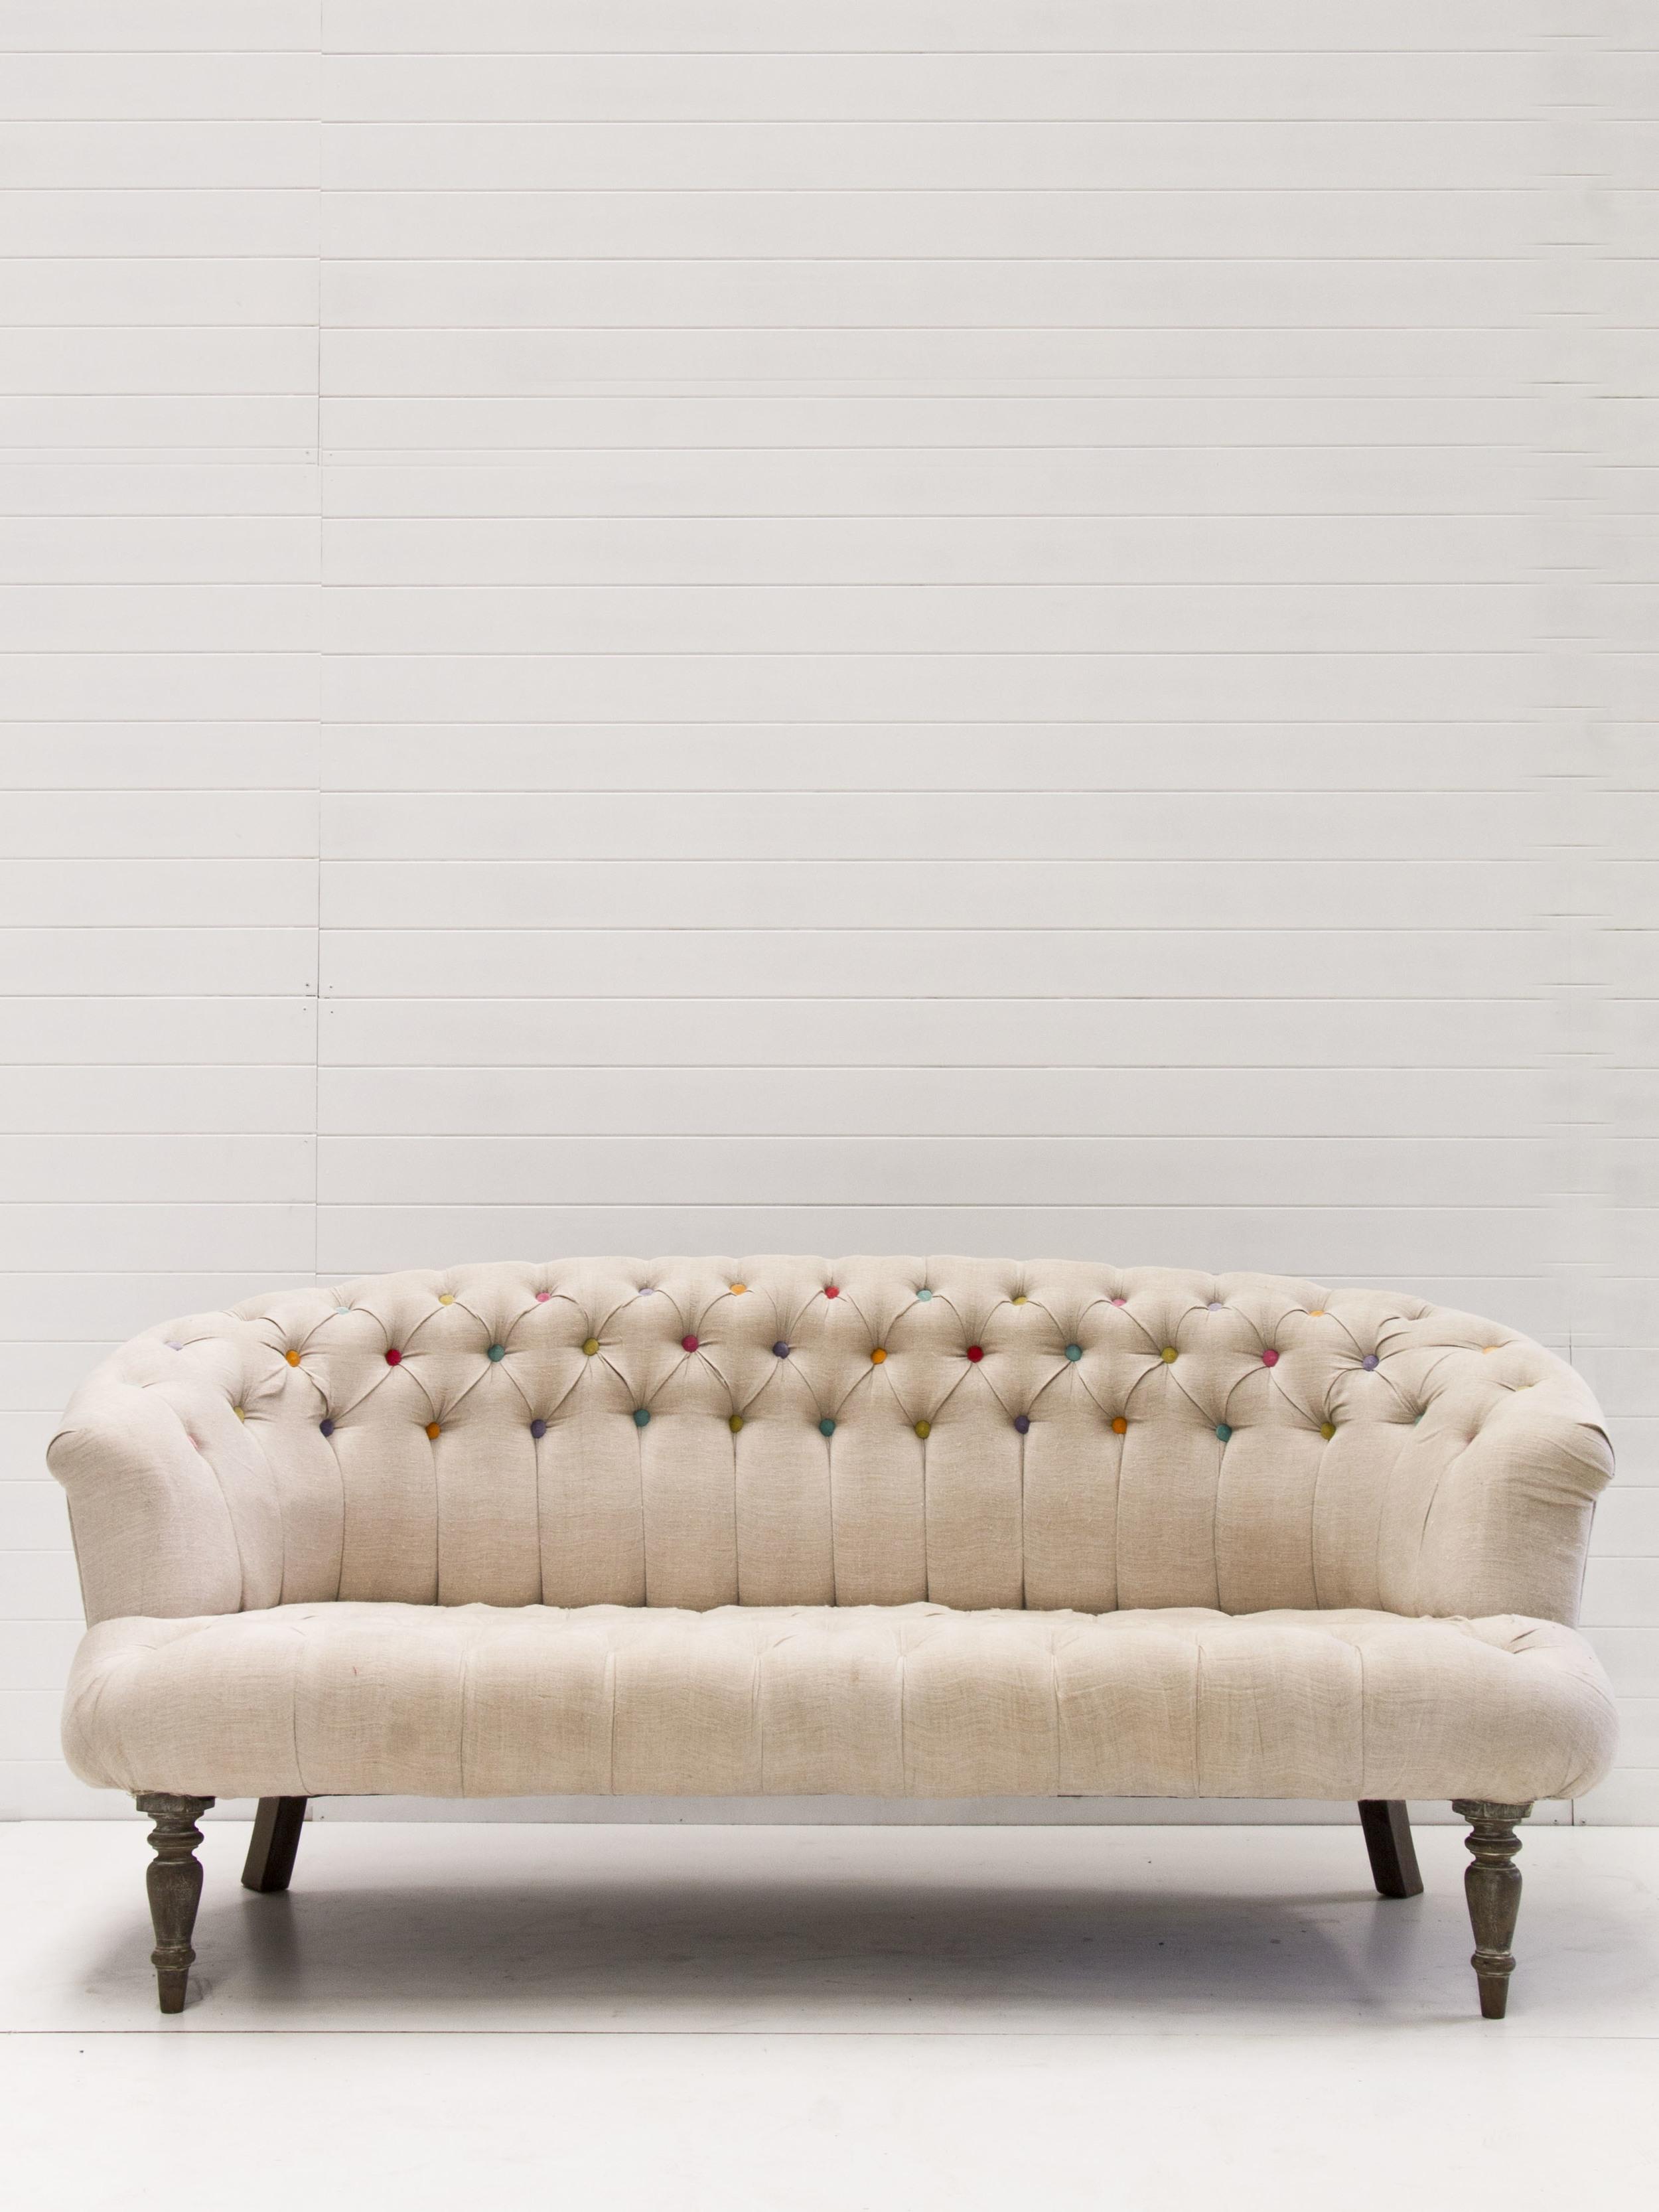 Coloured button tufted sofa.jpg